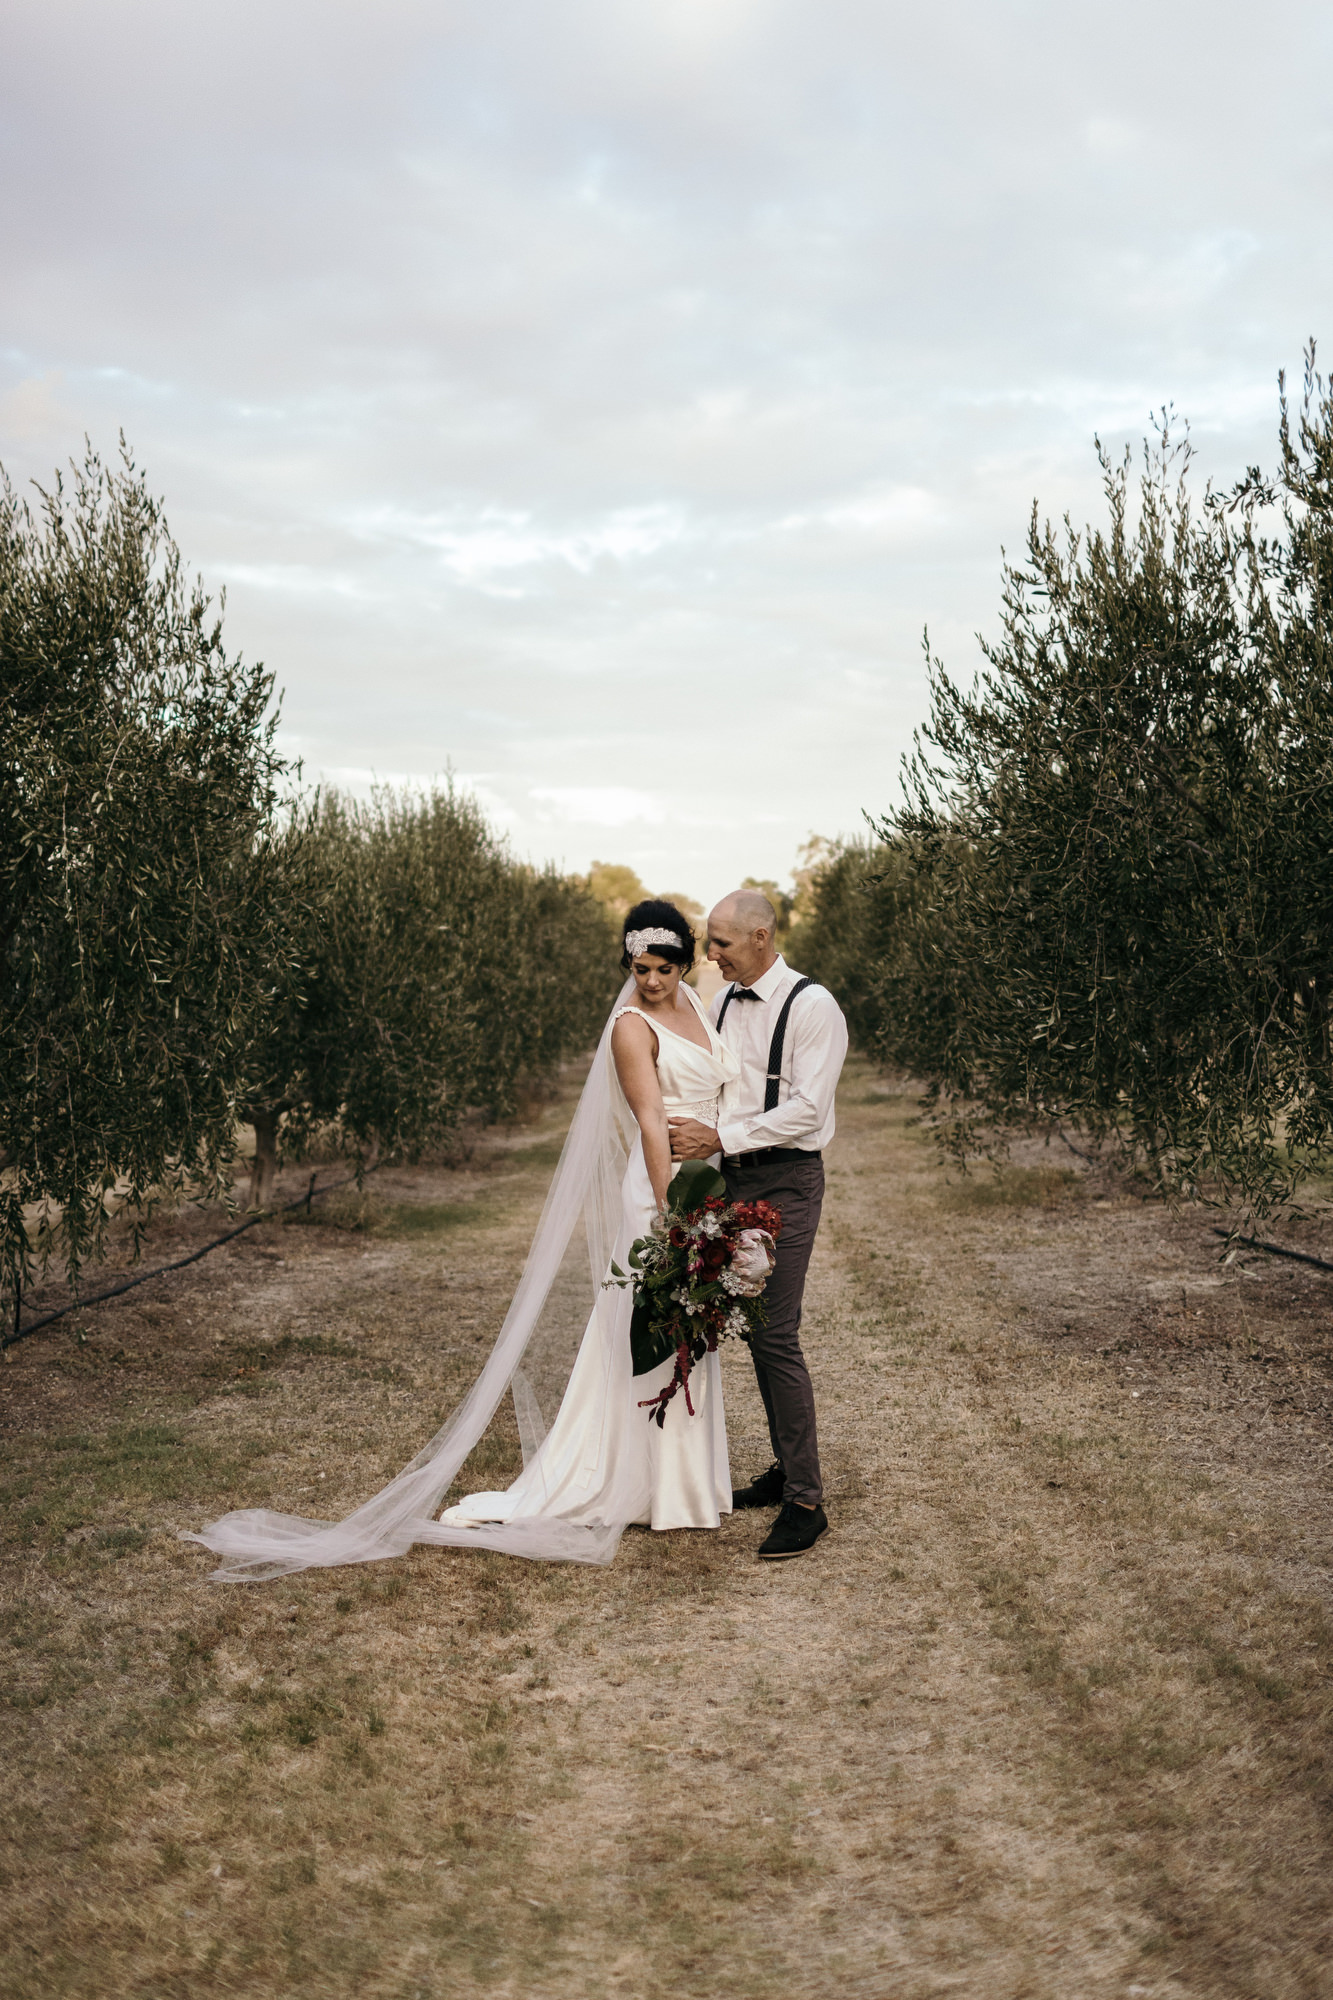 CLARK-WEDDING-EDITH-VALLEY-CARTER-ROSE-PHOTOGRAPHY-493.JPG